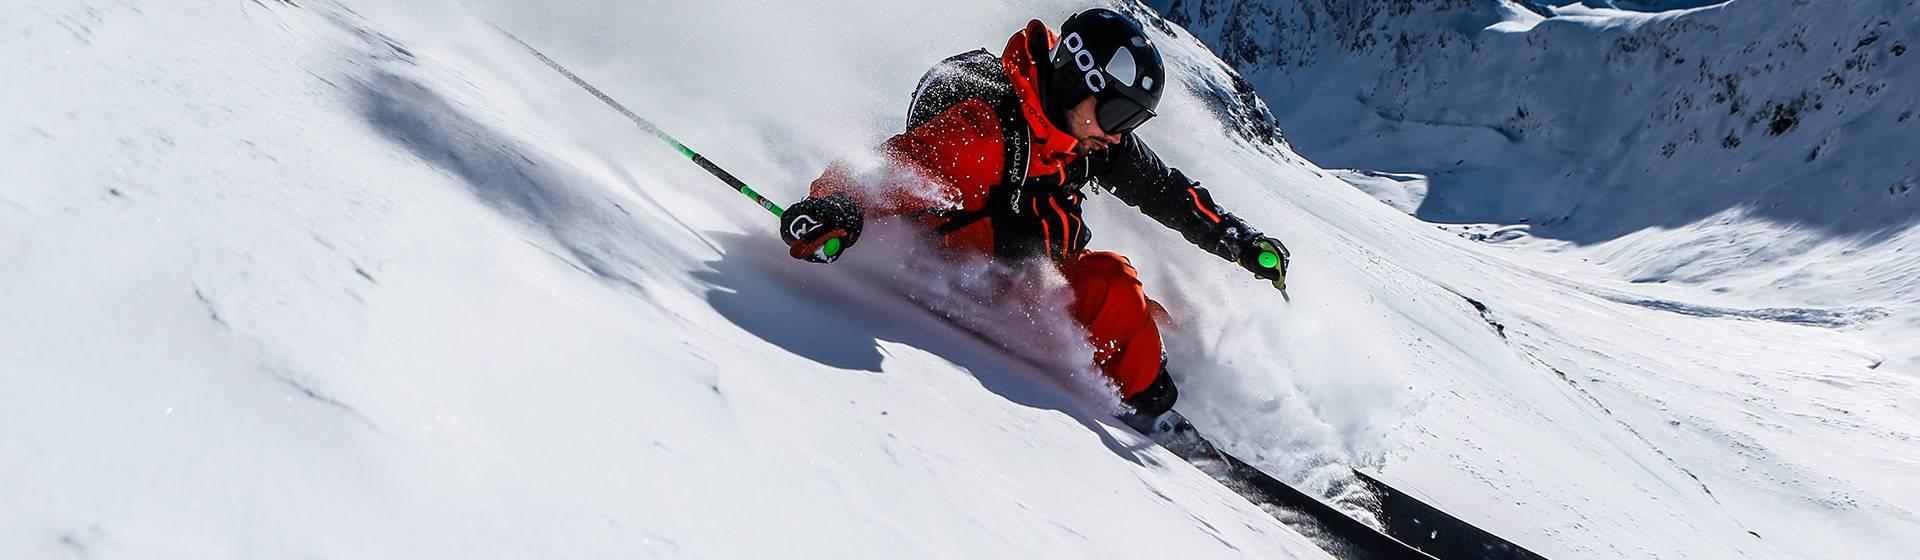 Freerider in deep snow in the best weather